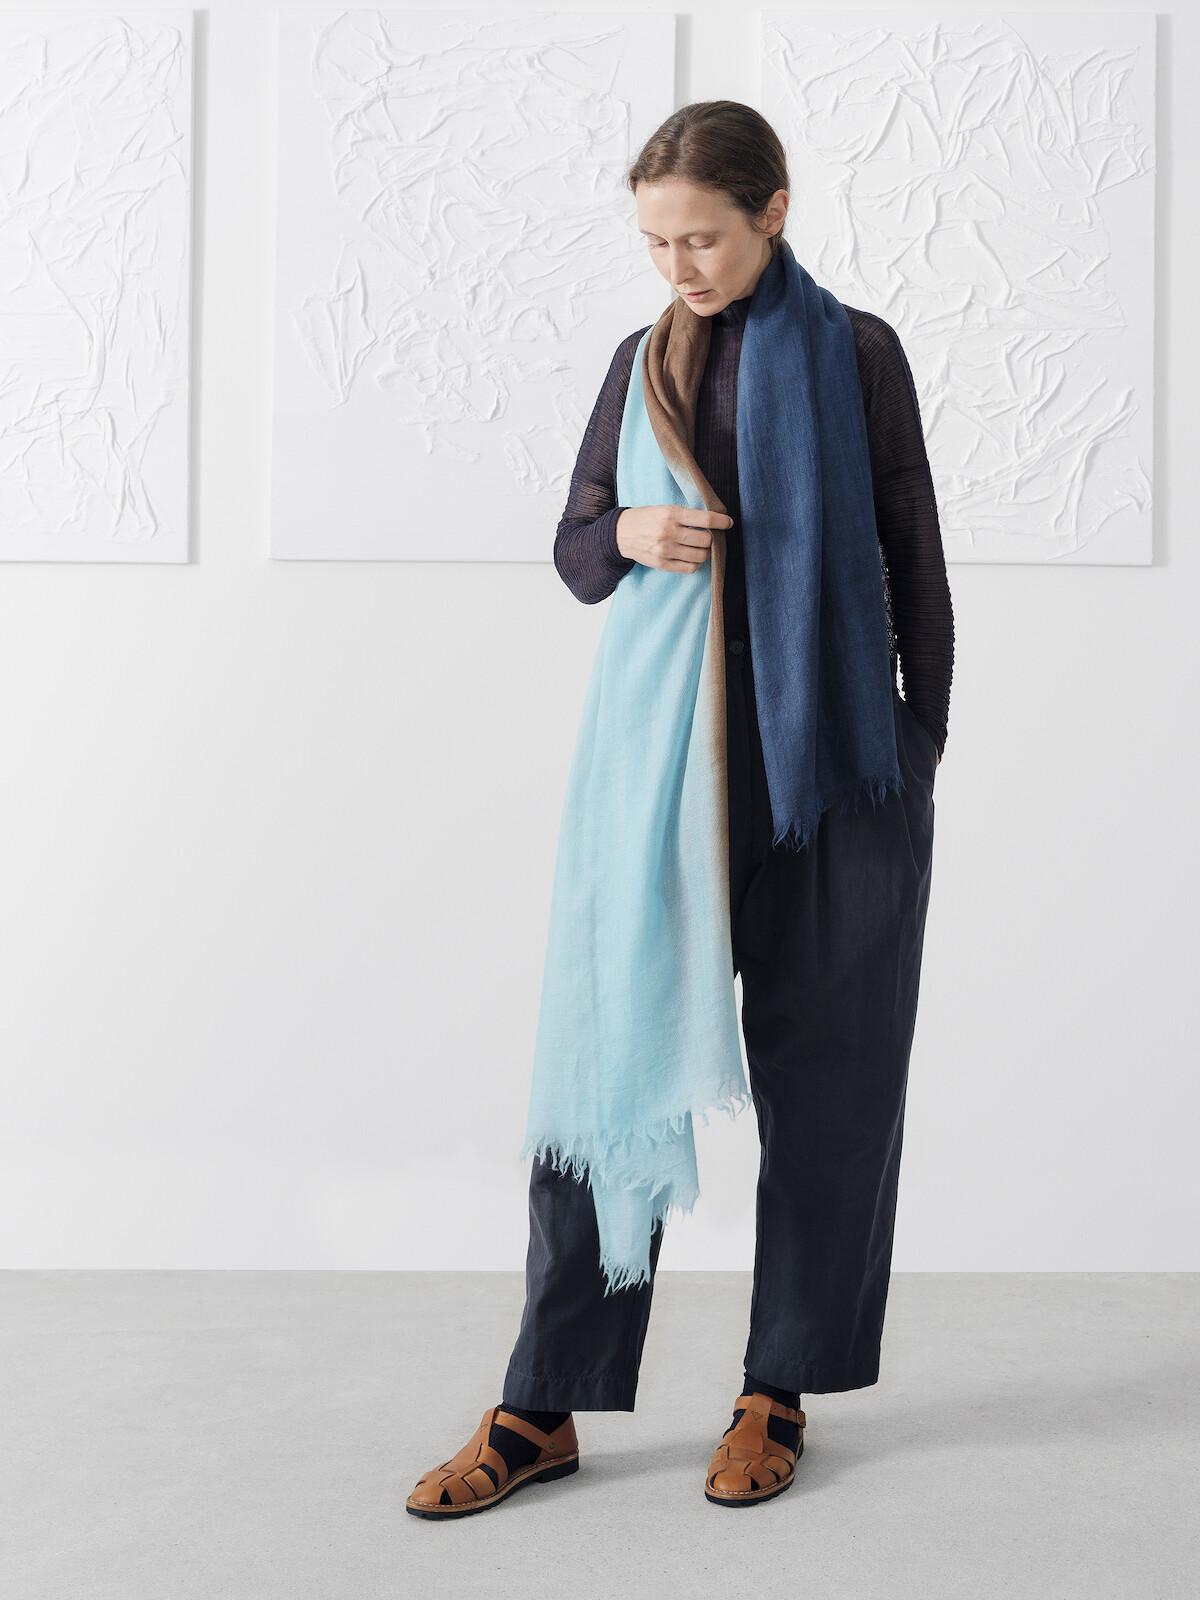 Handpainted scarf Image